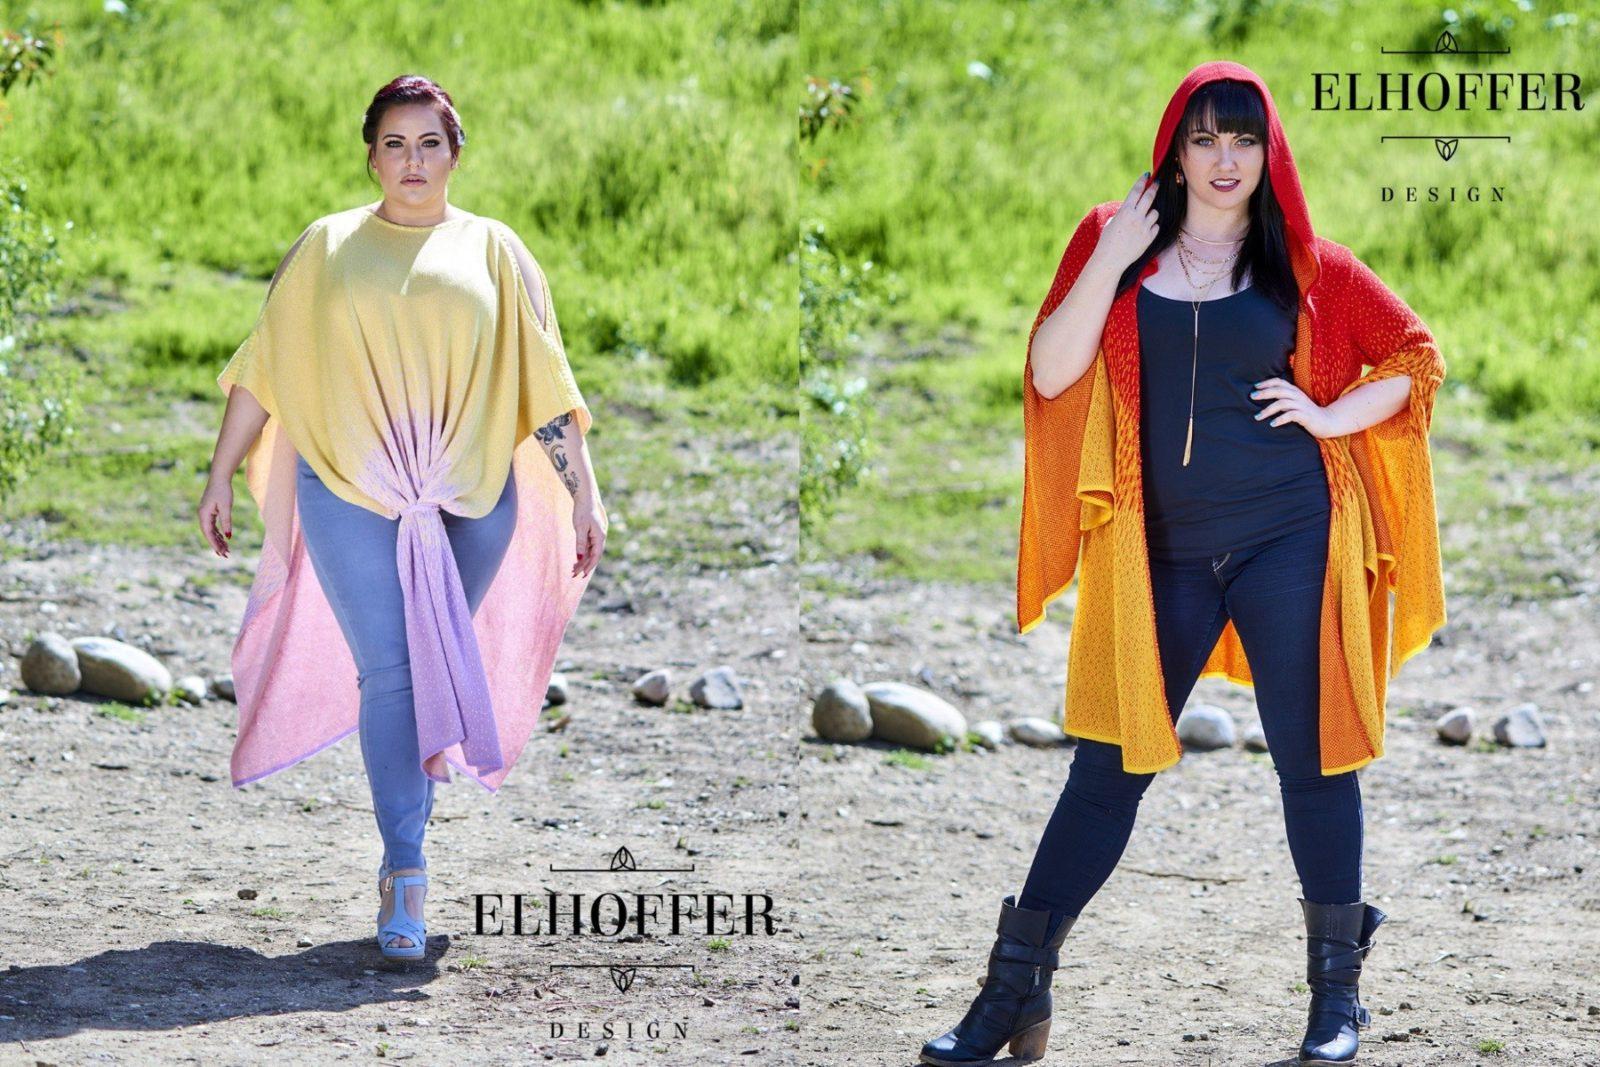 More Padme' apparel from Elhoffer Design